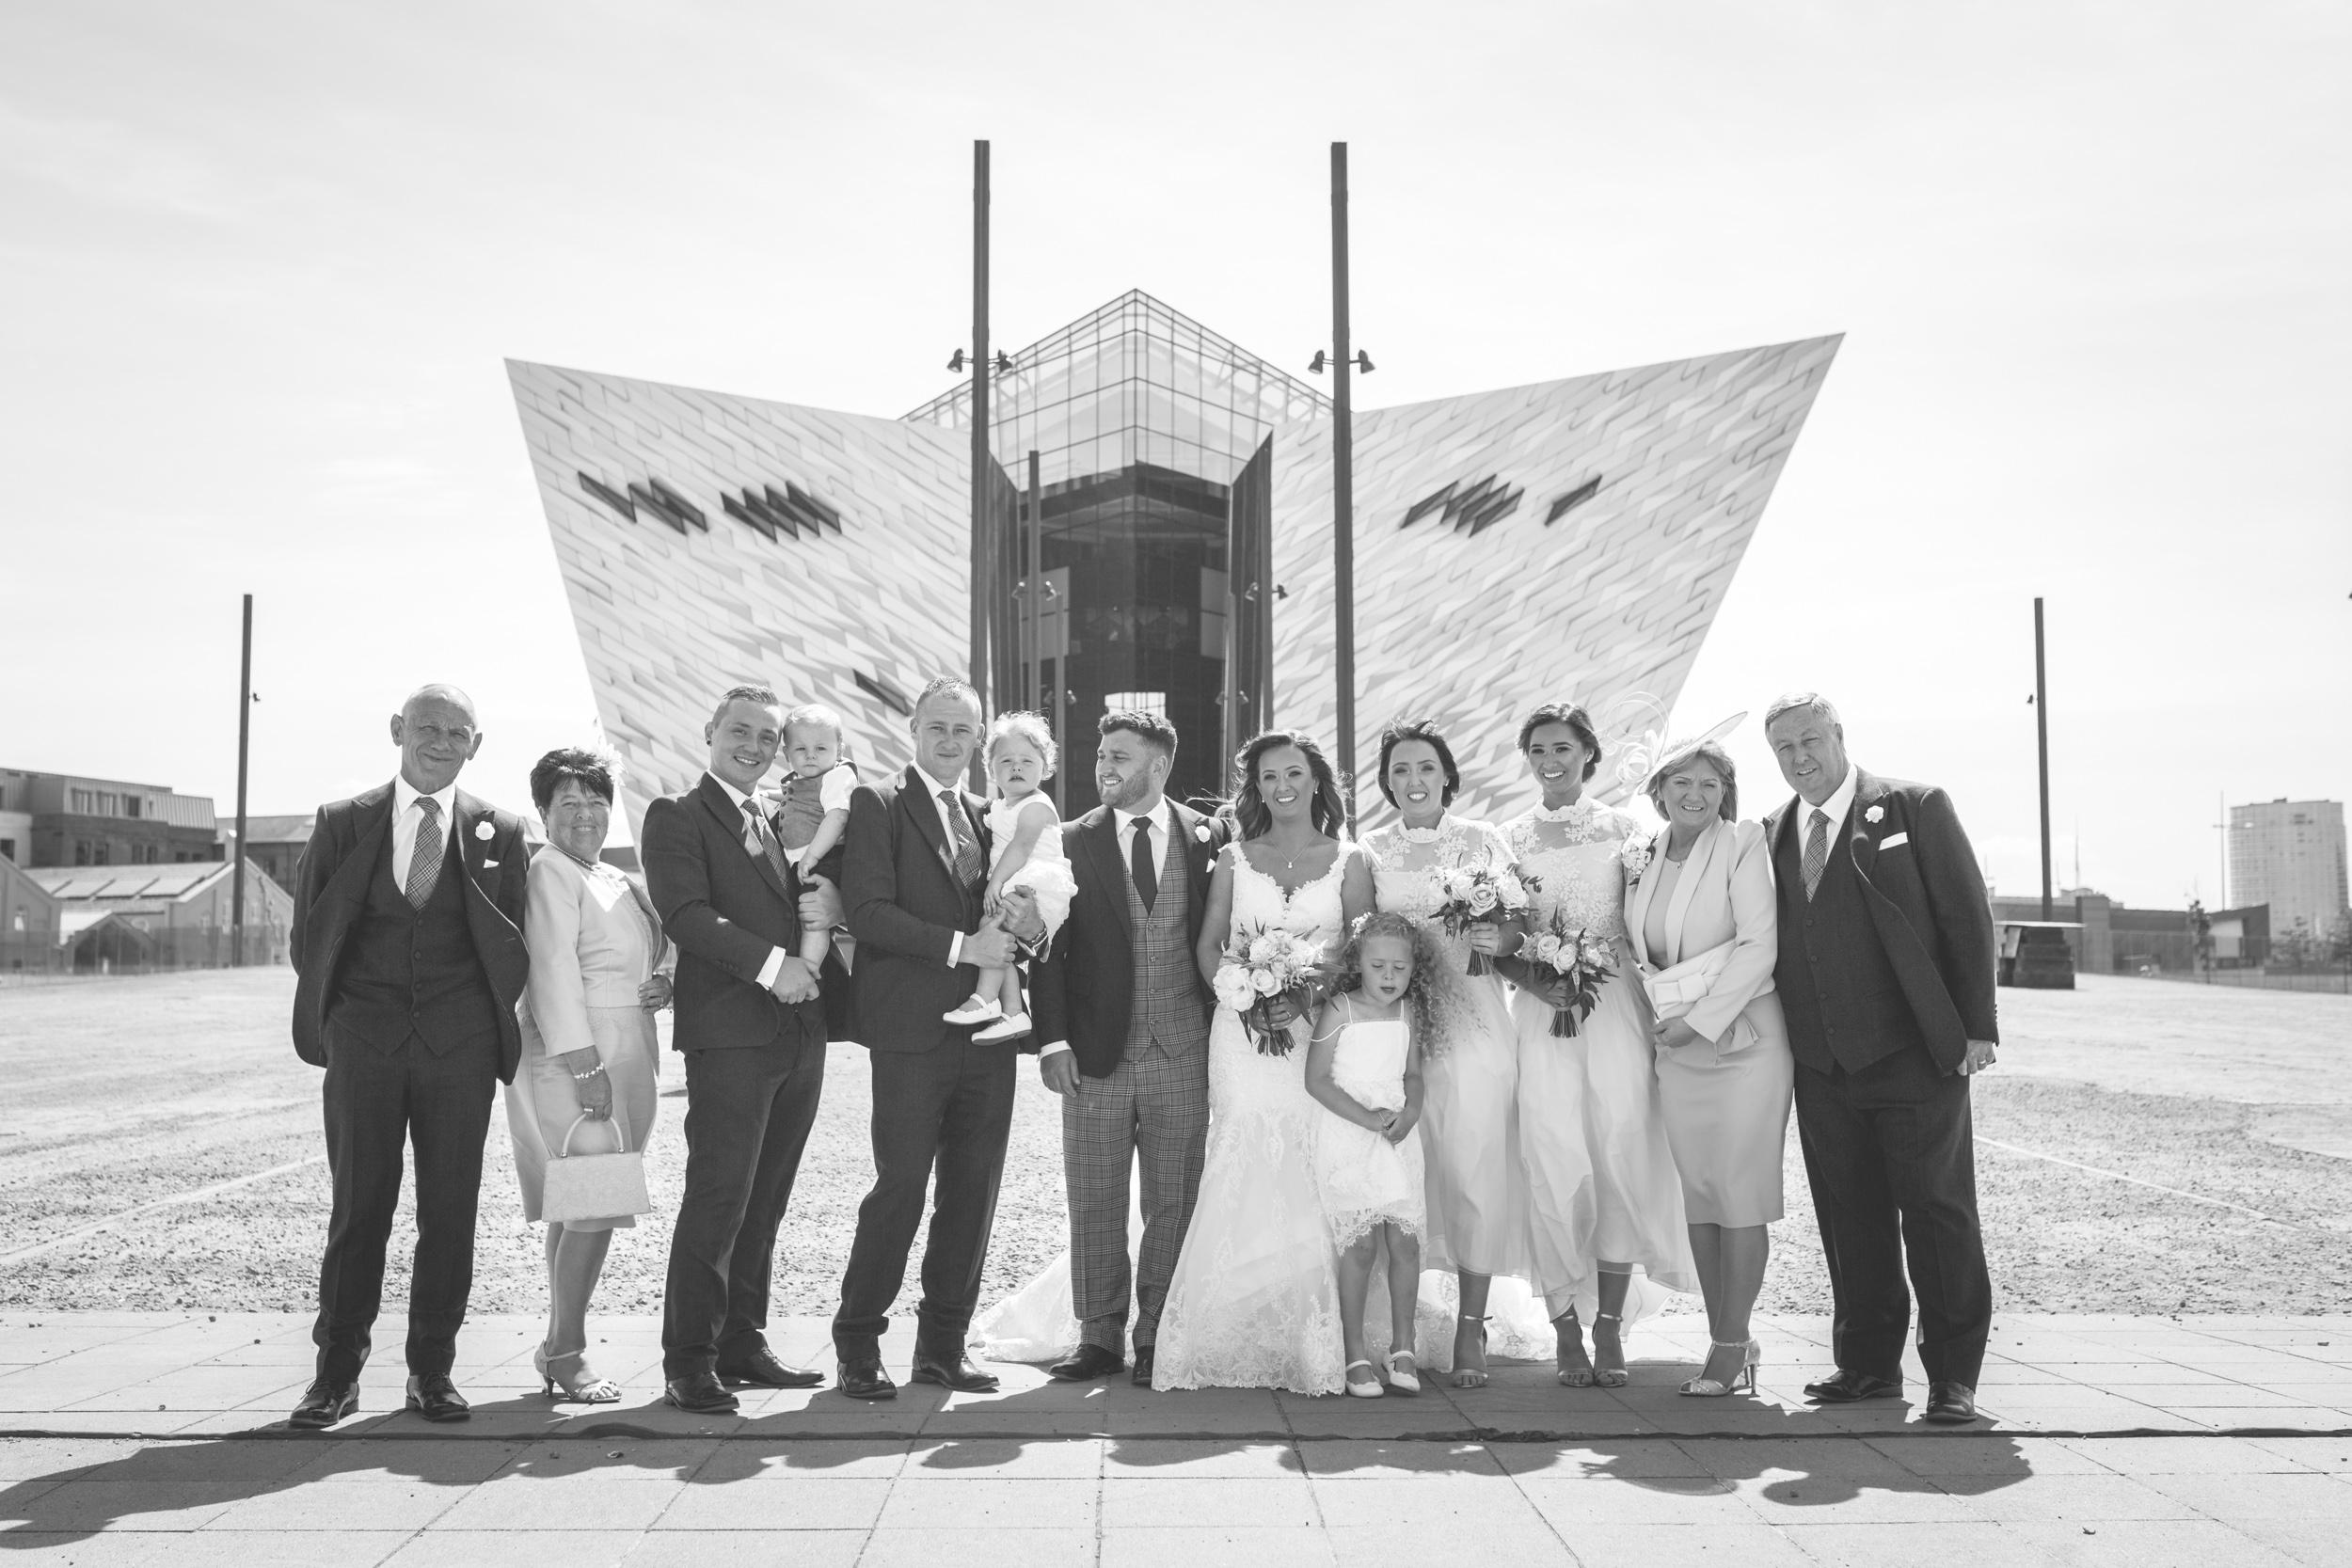 Brian McEwan   Northern Ireland Wedding Photographer   Rebecca & Michael   Portraits-21.jpg